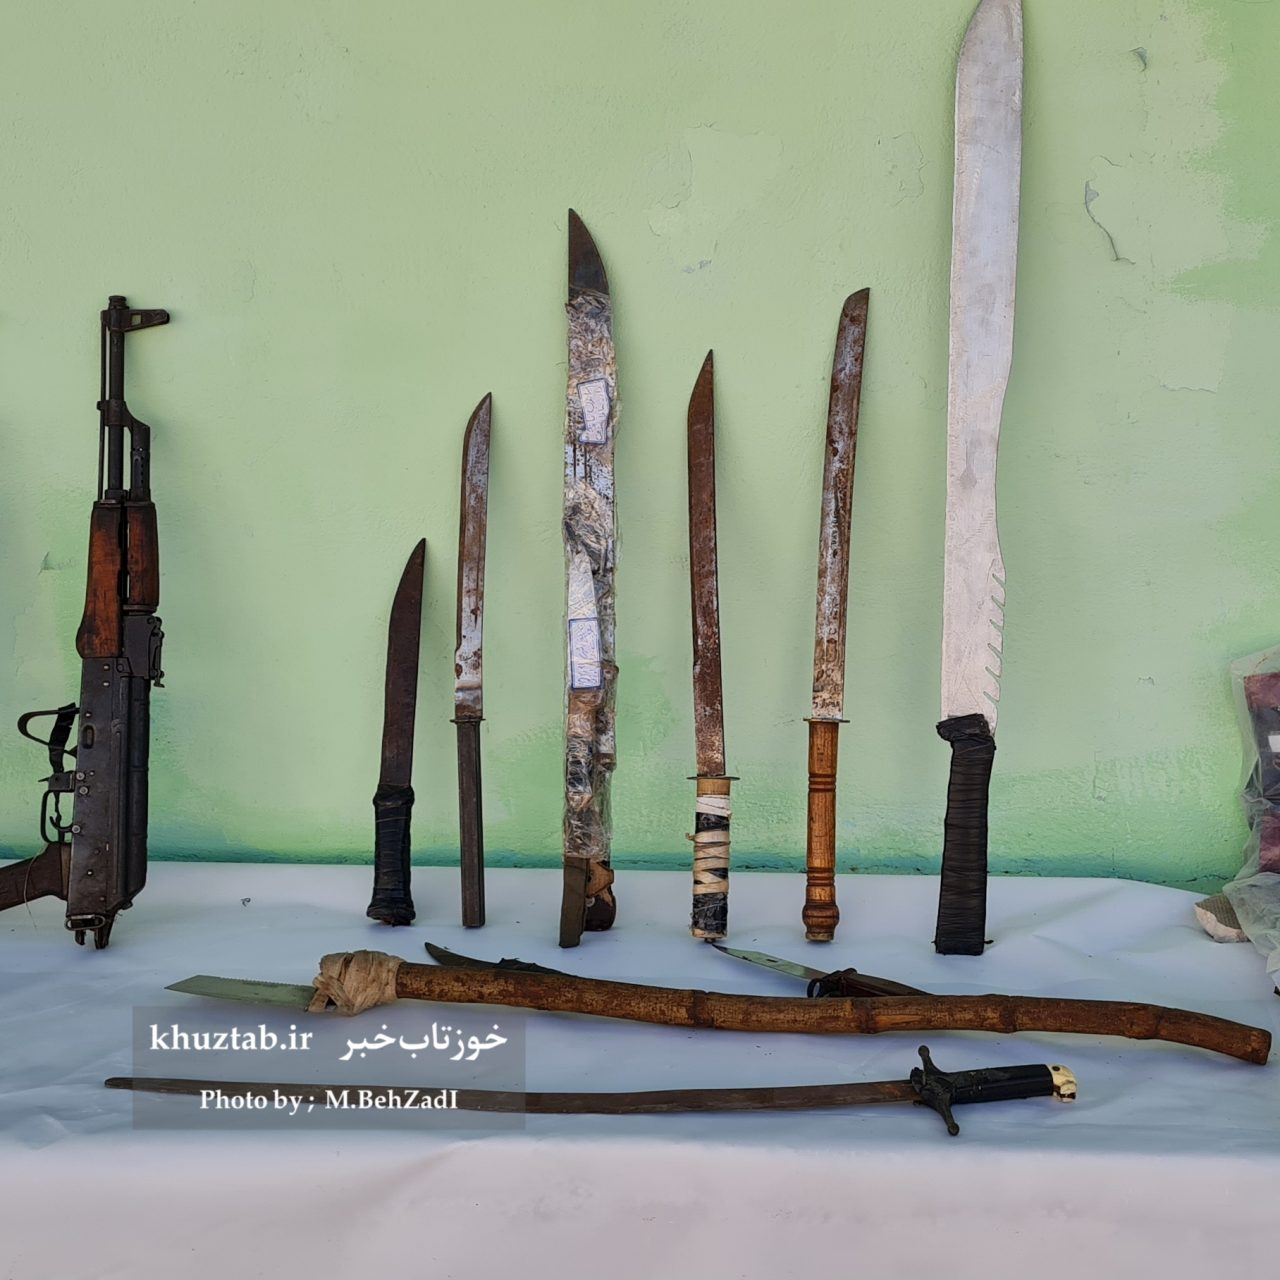 PicsArt 06 27 12.42.11 1280x1280 کشف بیش از 4 تُن انواع مواد مخدر در خوزستان/ افزایش 29 درصدی کشفیات قاچاق/ انهدام 21 باند سرقت مسلحانه/کشف ۱۵۱۲ دستگاه ماینر